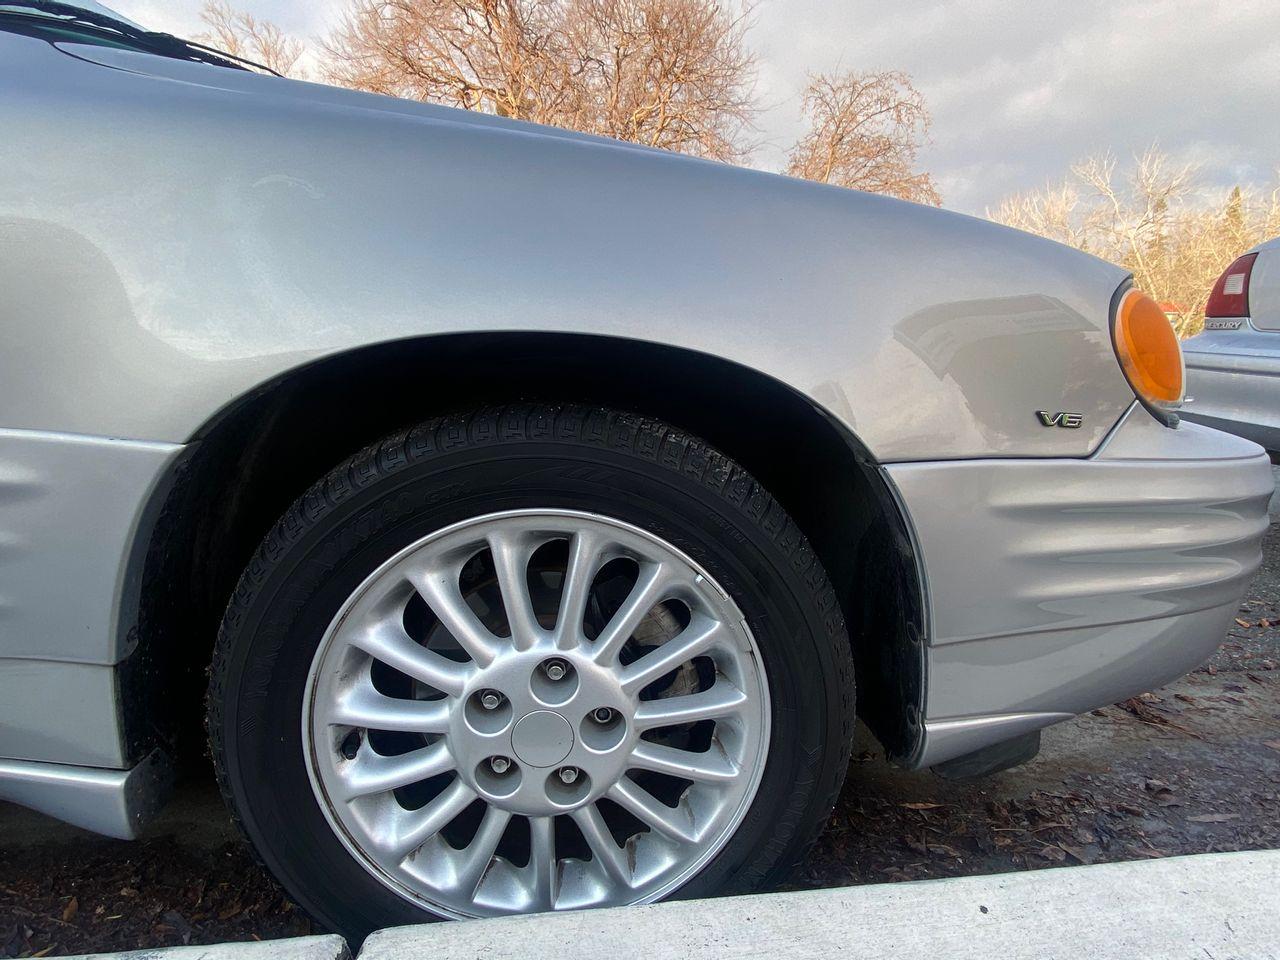 2000 Pontiac Grand Am SE2 | San Jose, CA, Silvermist Metallic (Silver), Front Wheel